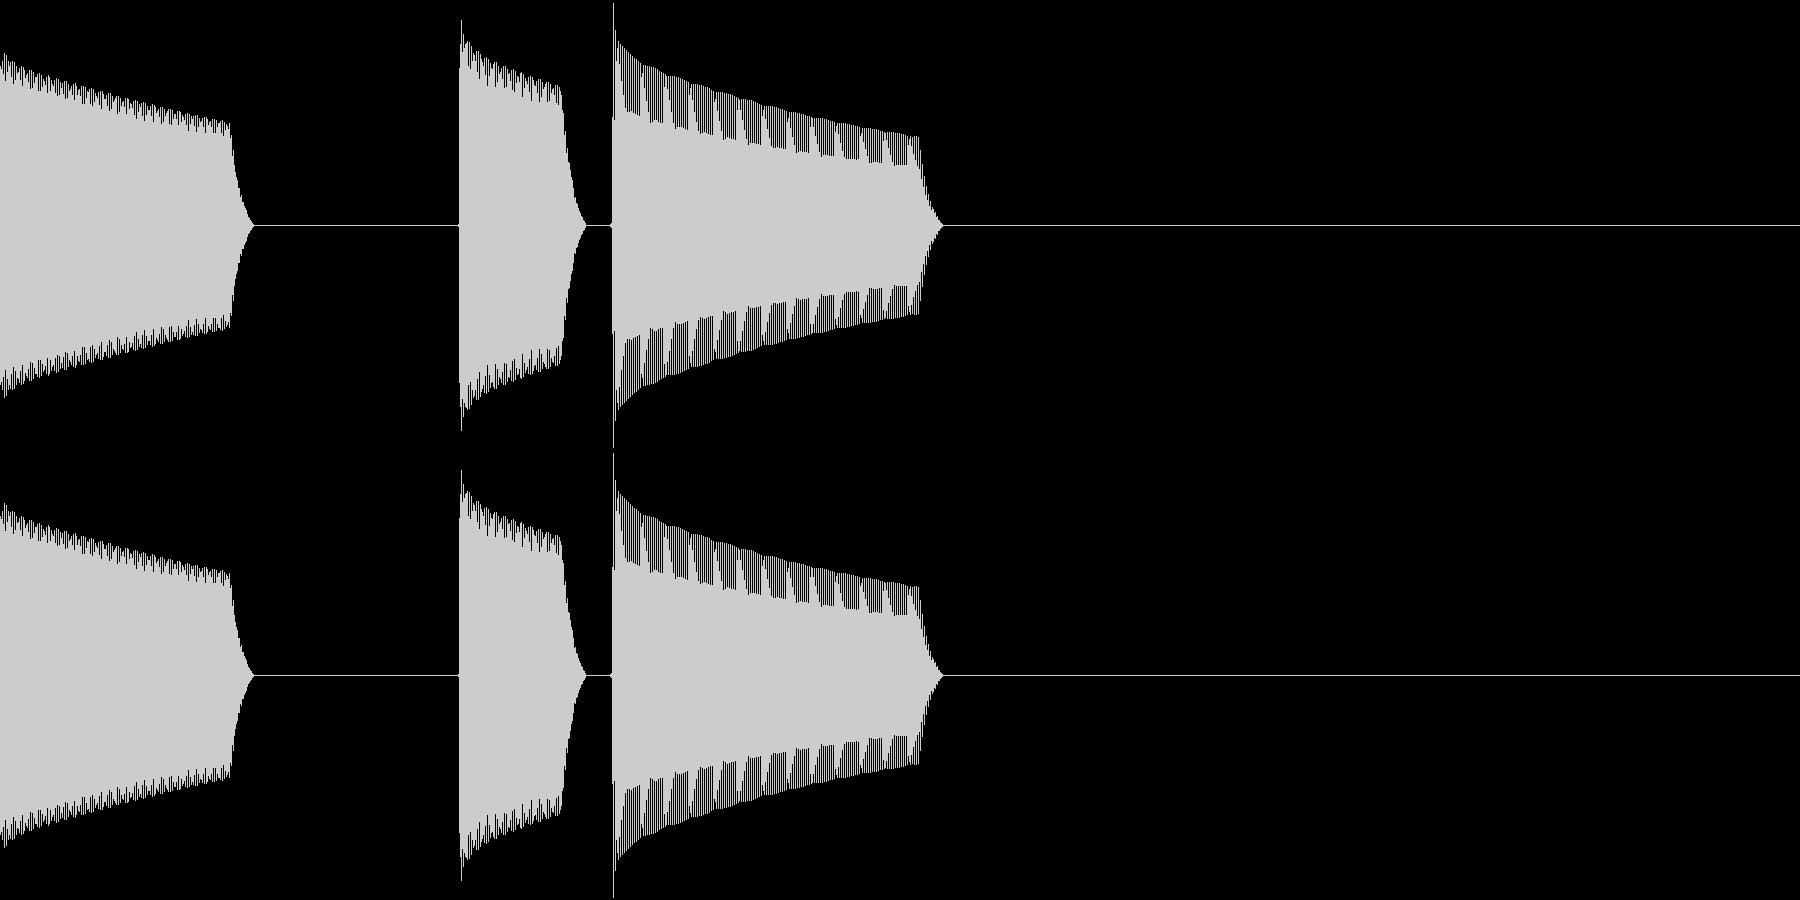 ATM 操作音 6の未再生の波形